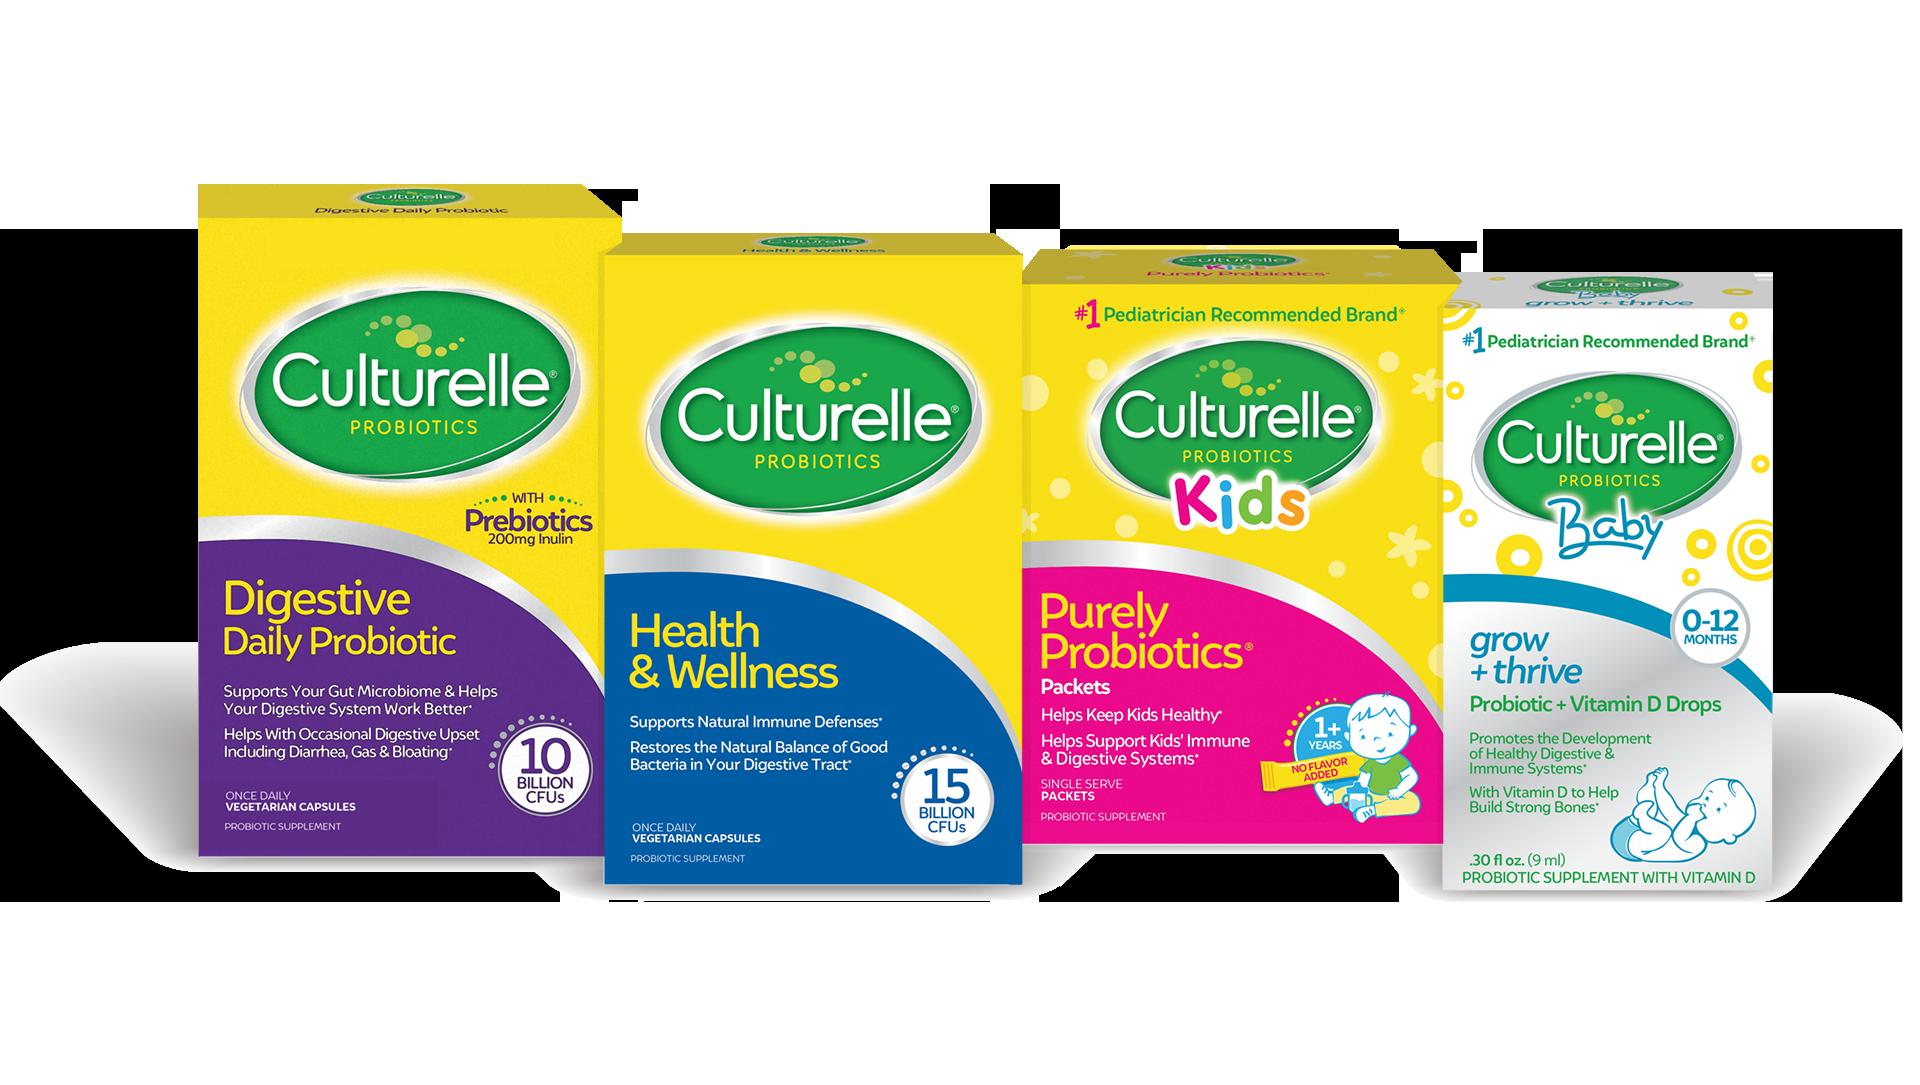 Four Culturelle product packages